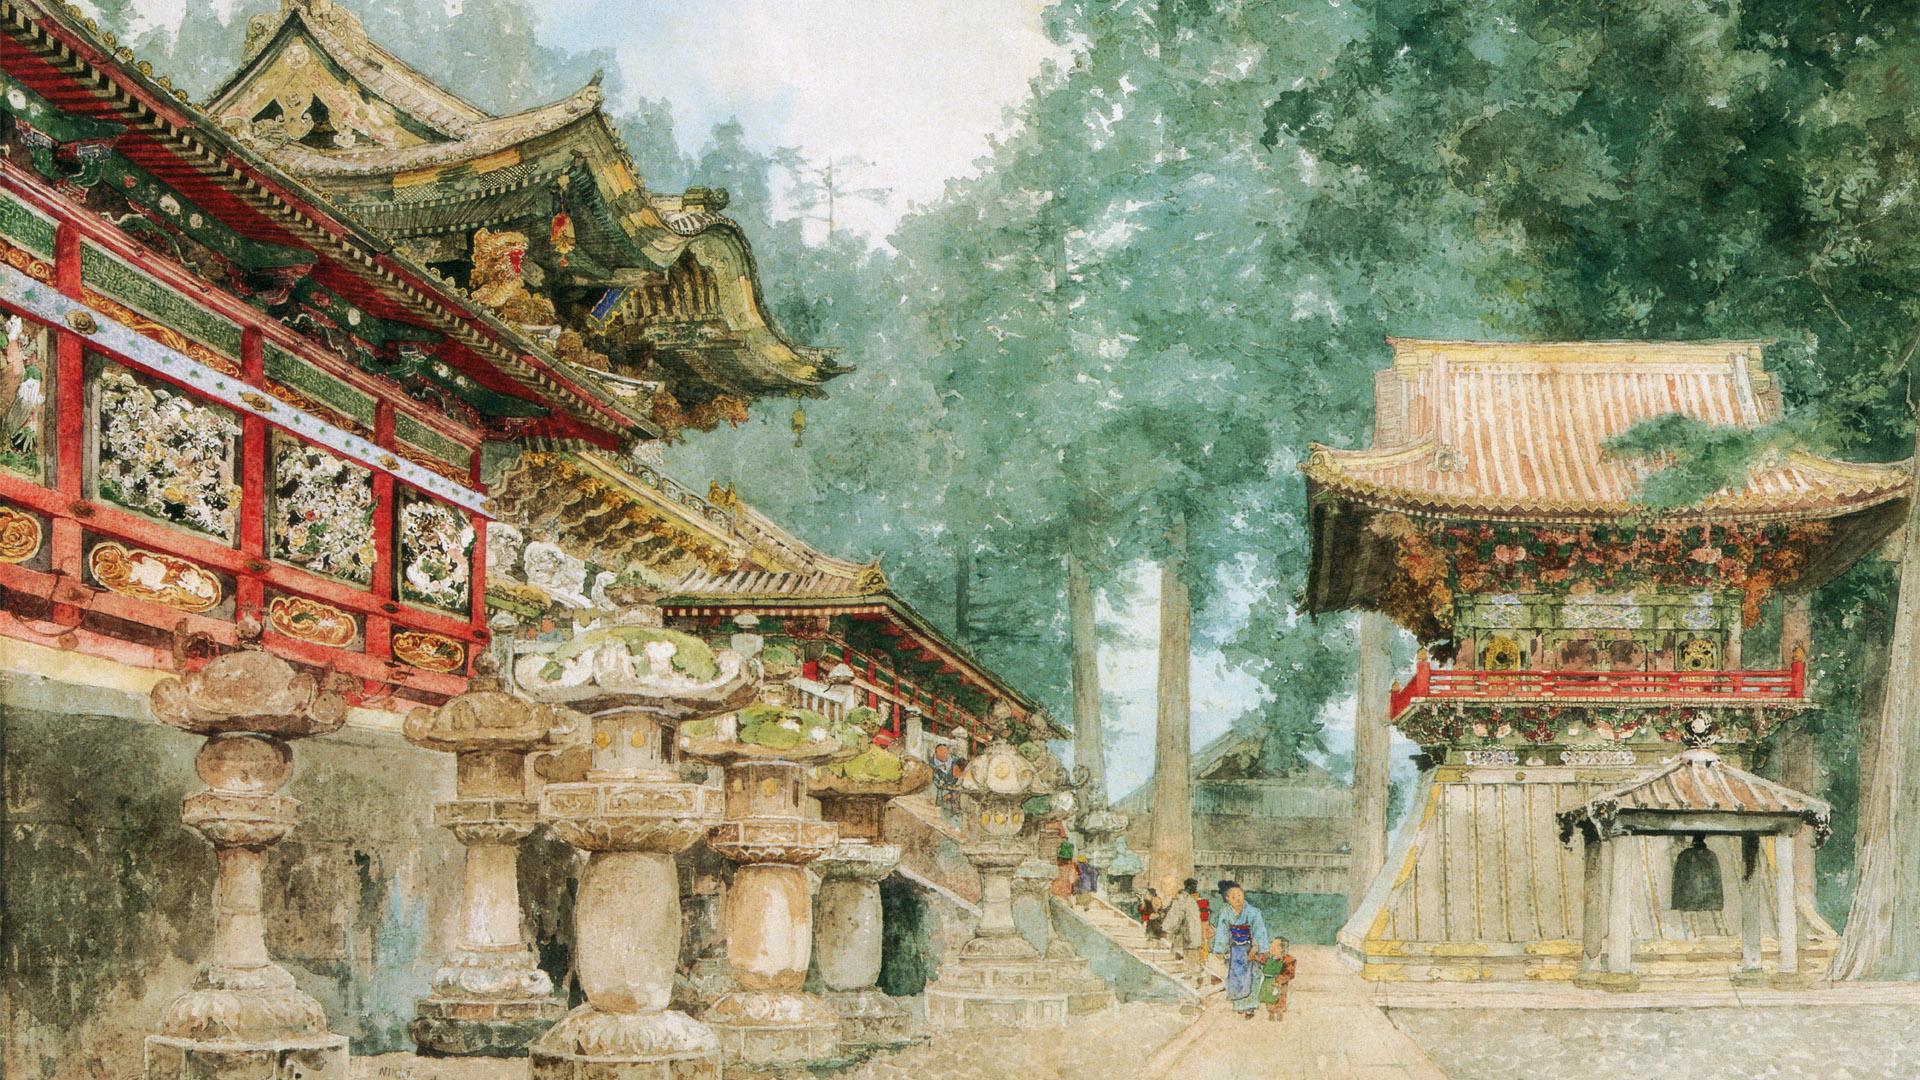 吉田博 日光 Yoshida Hiroshi - Nikko 1920x1080